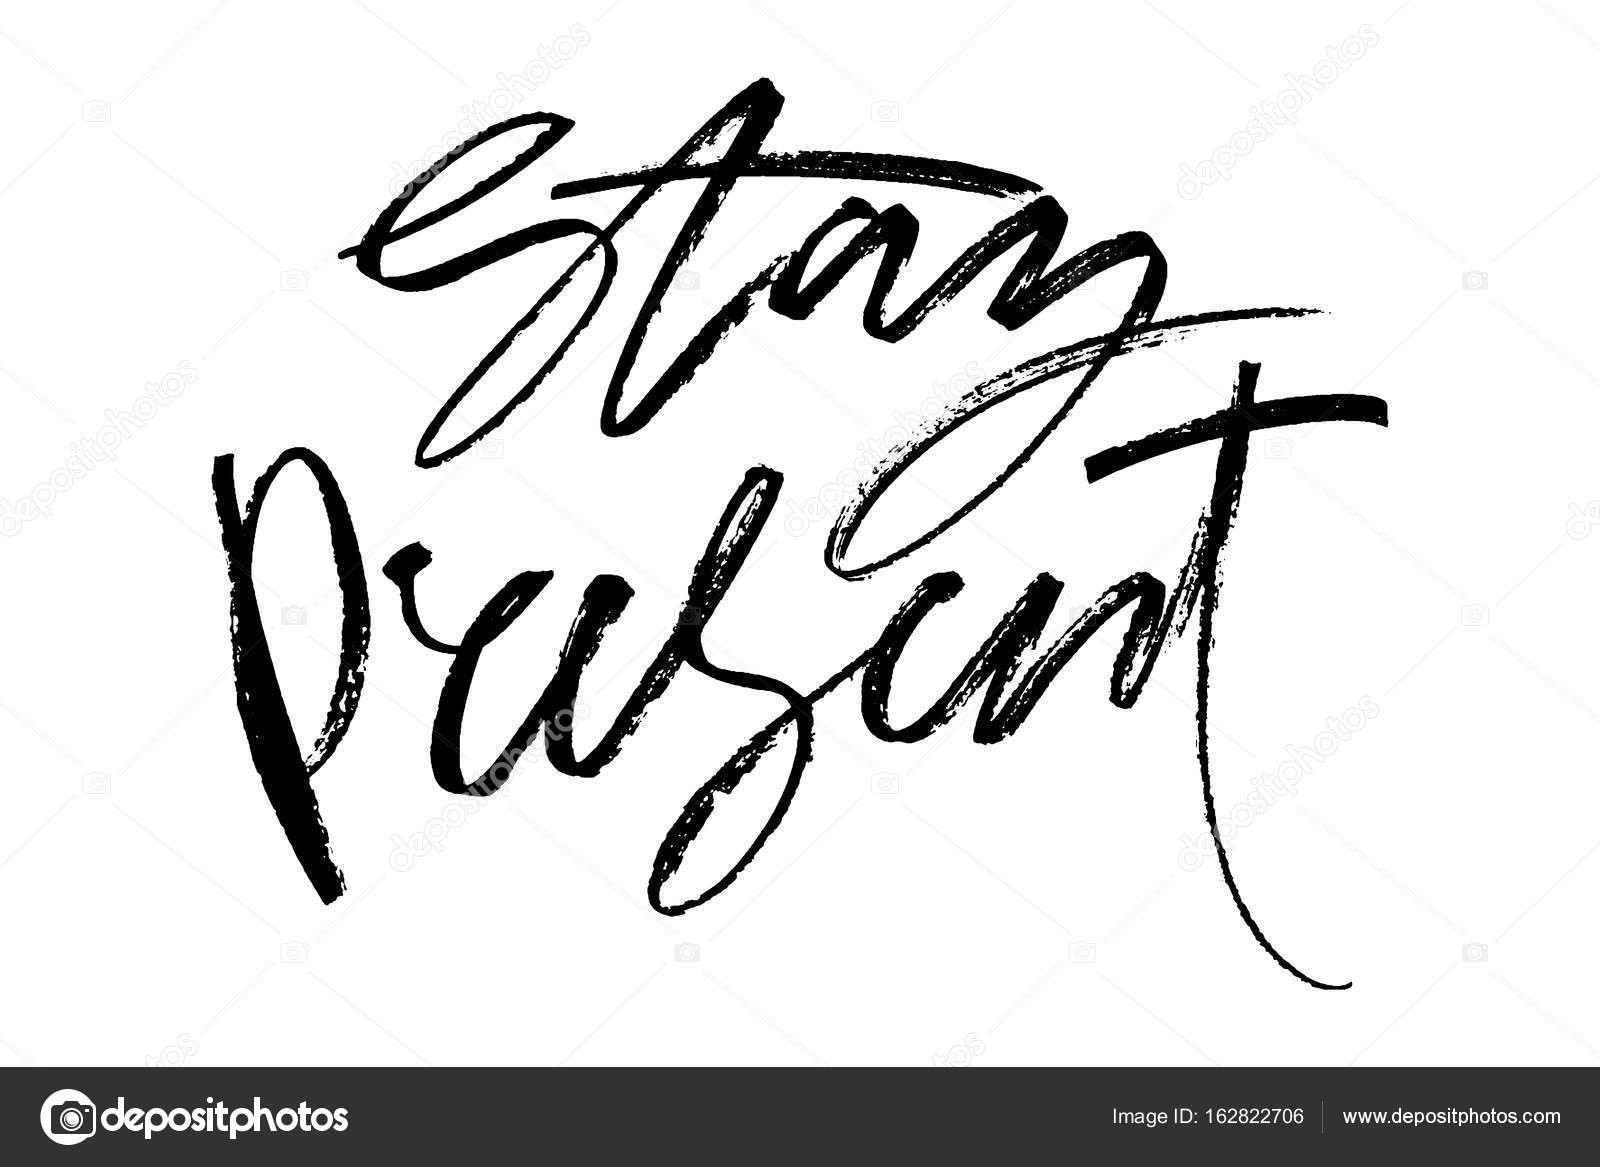 Letras de vector dibujado a mano. Palabras alojarte presente a mano ...